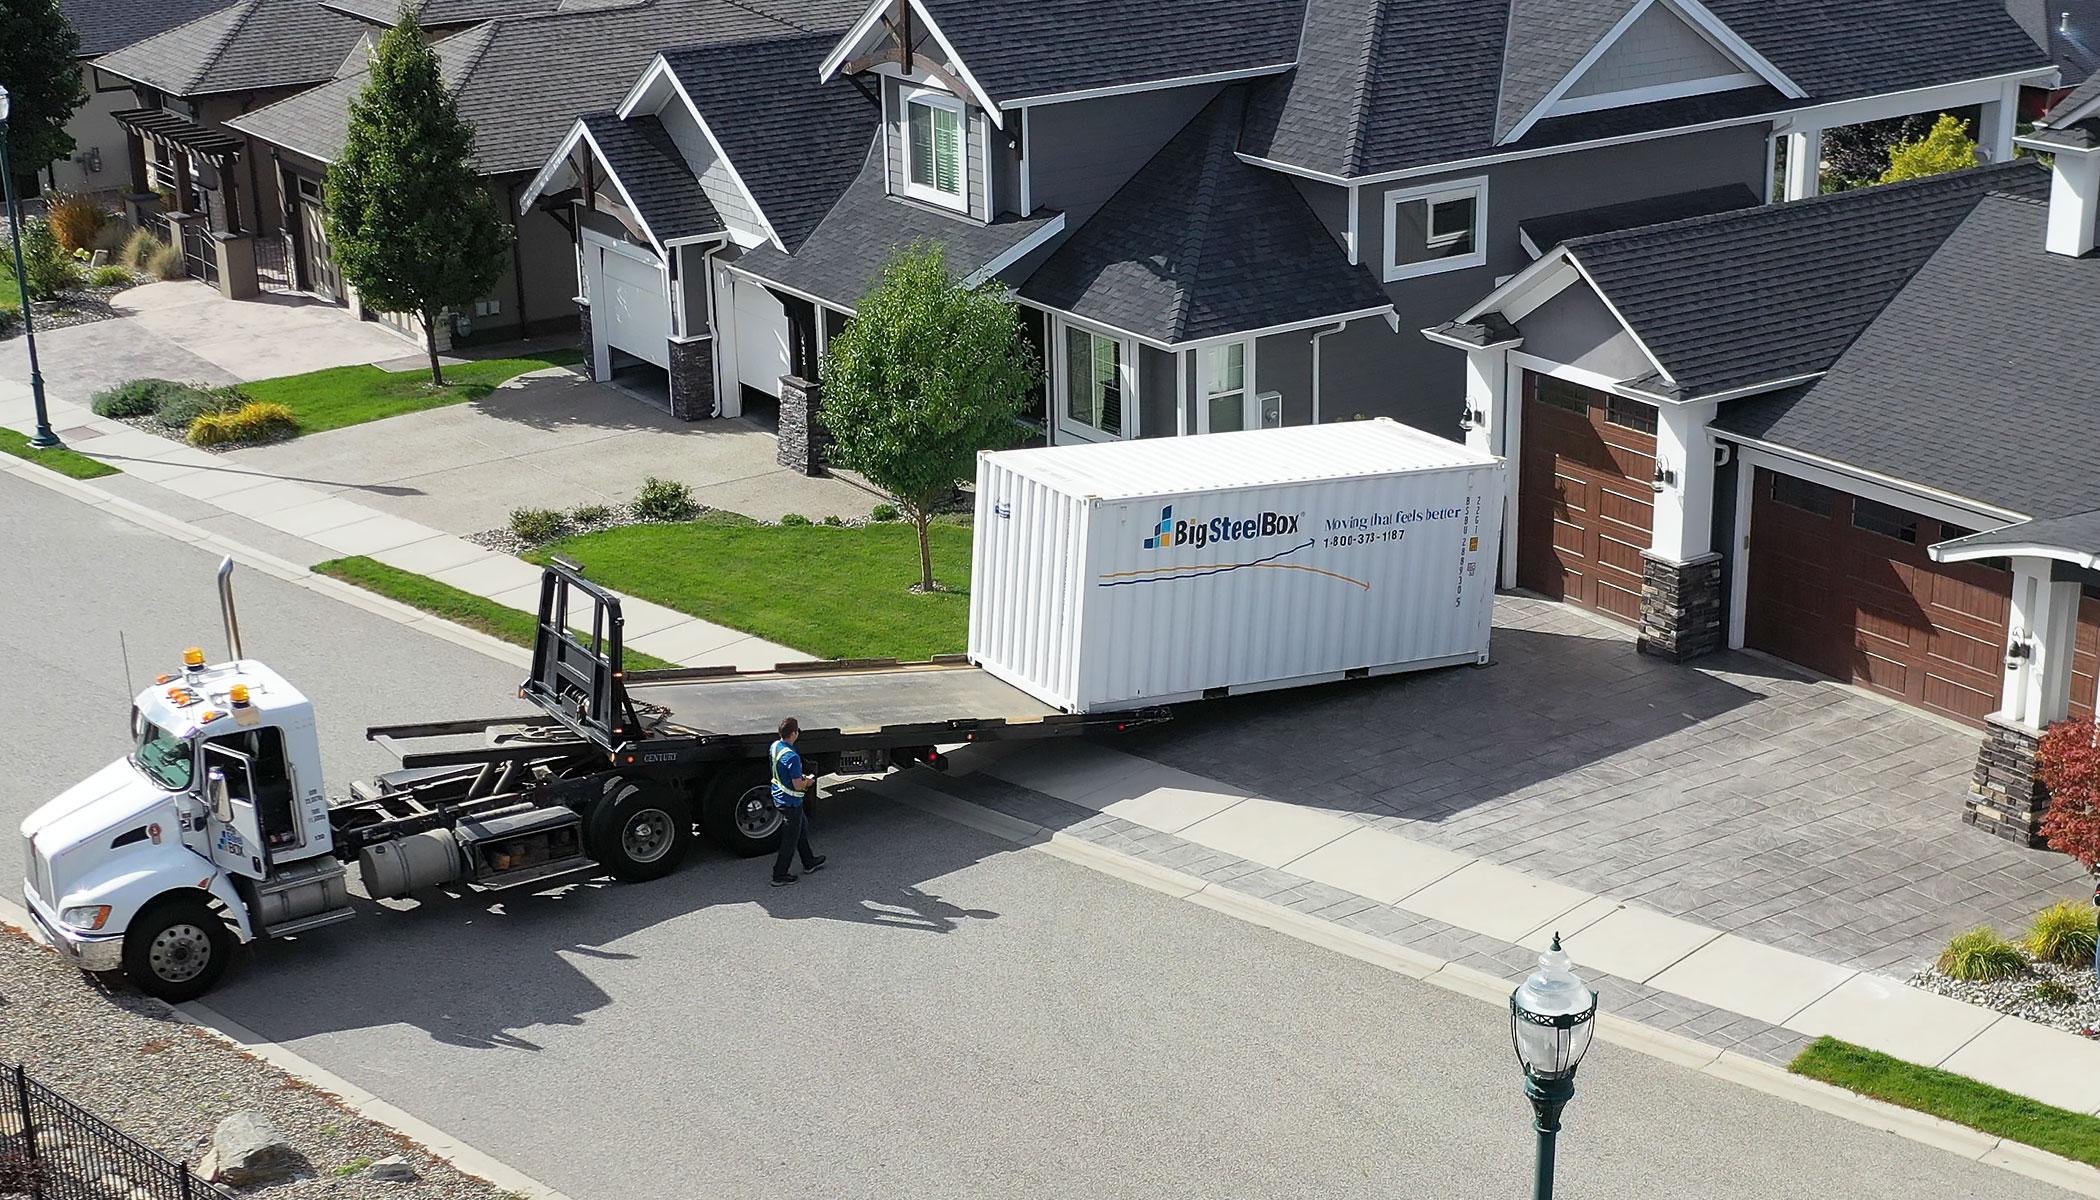 How we deliver a BigSteelBox